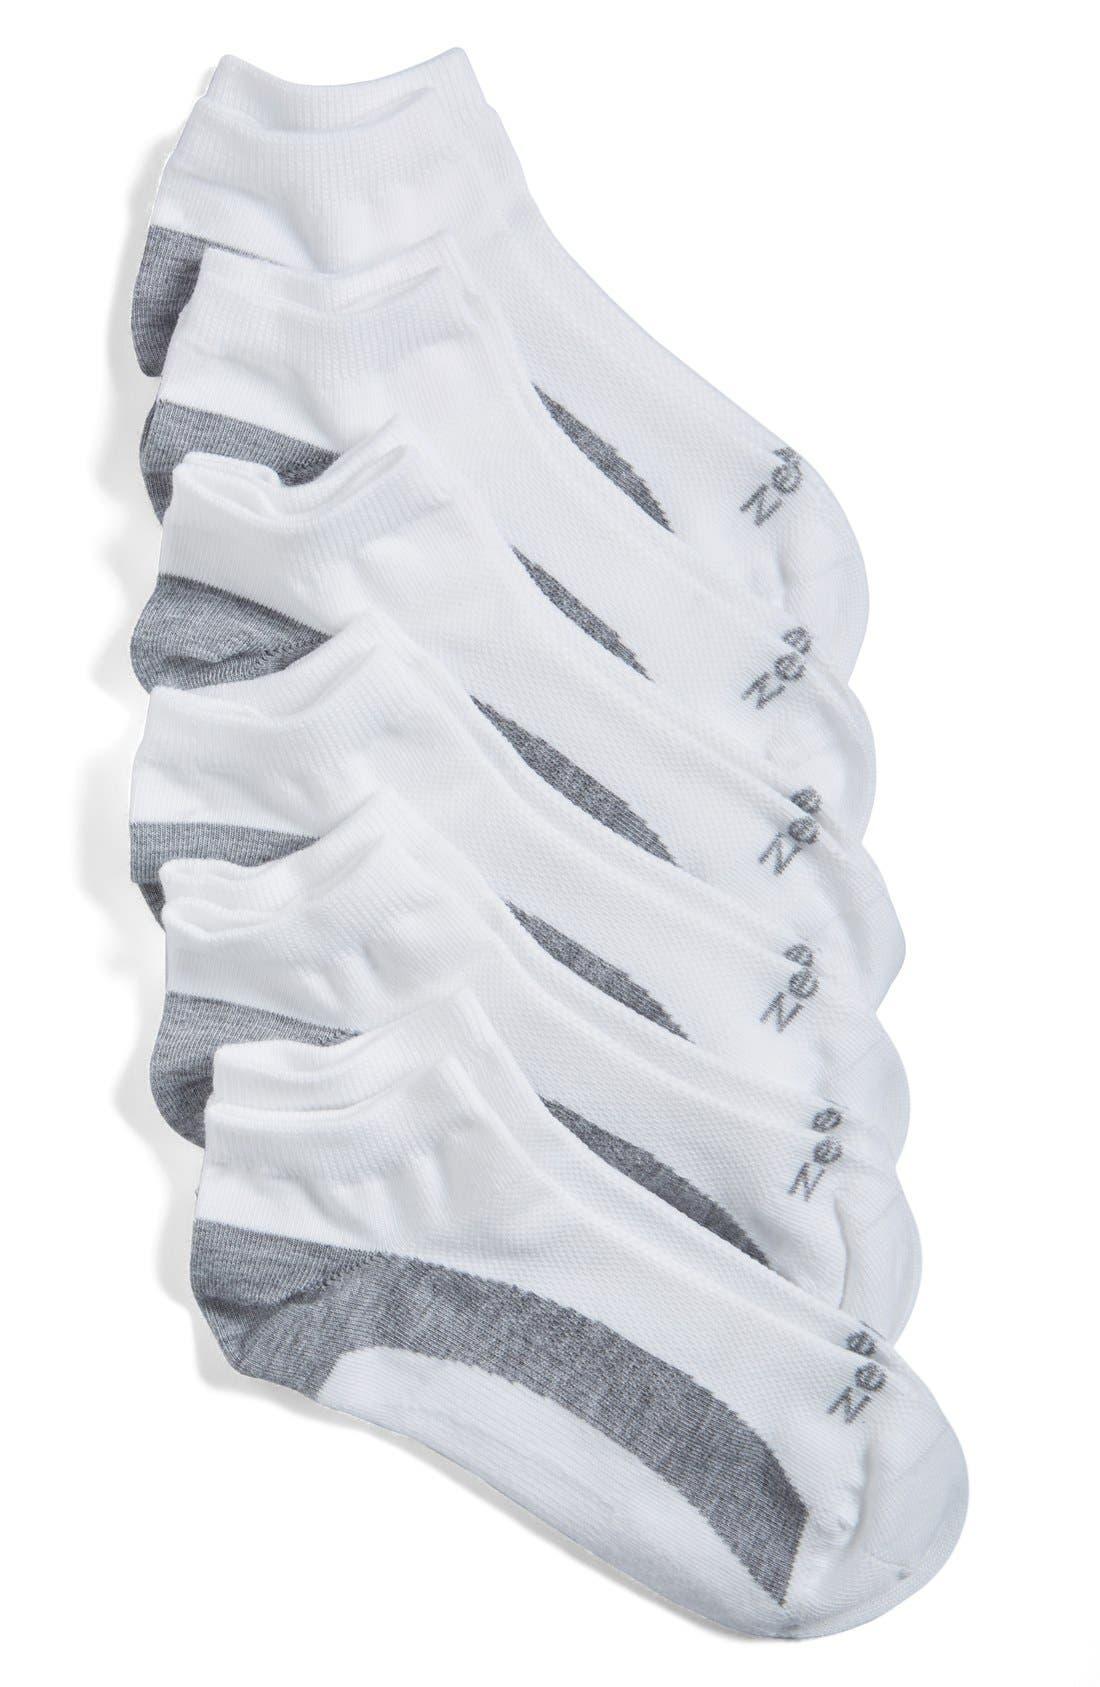 Zella 6-Pack Liner Socks